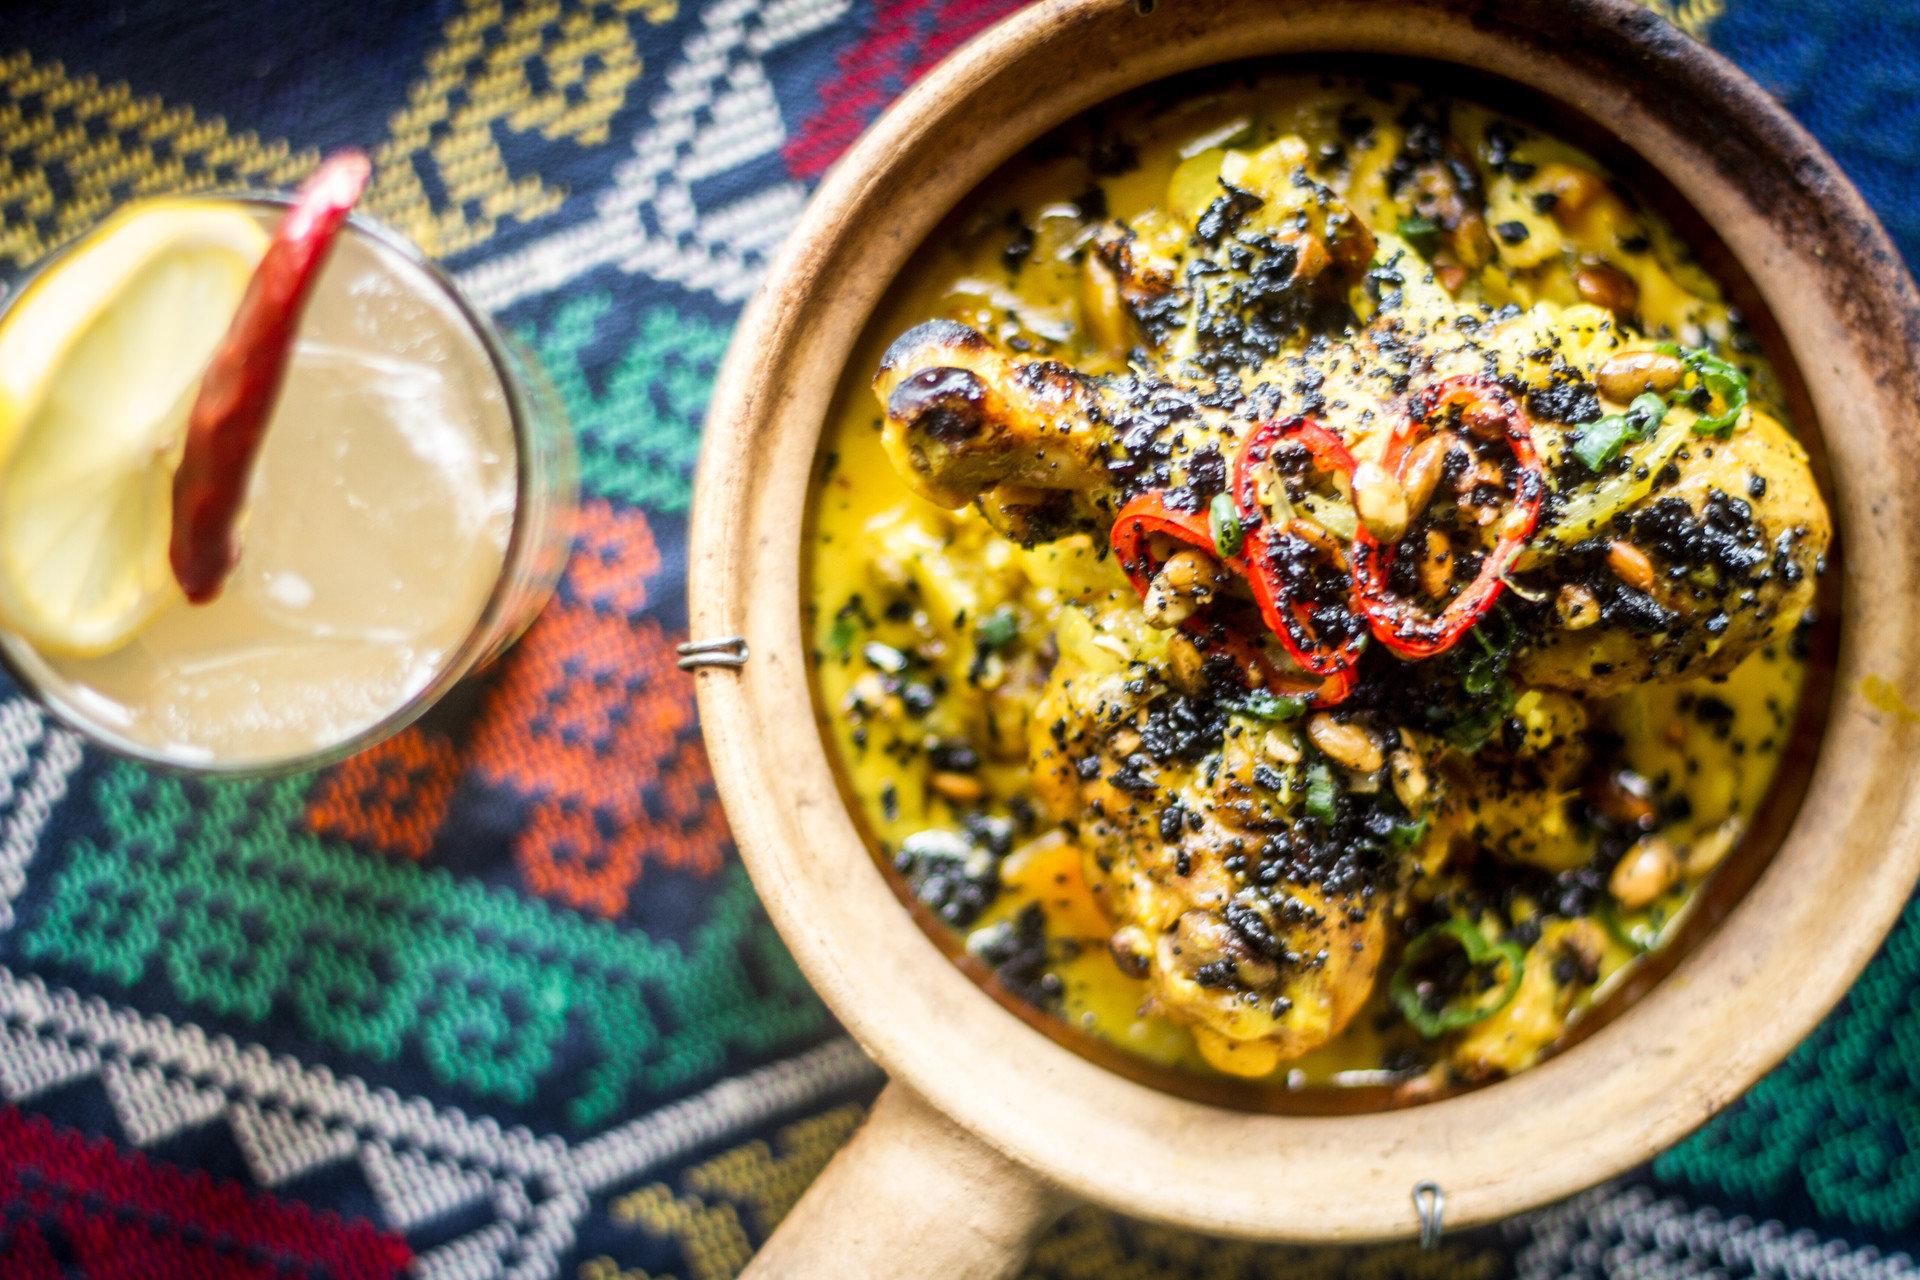 Food + Drink dish food plant produce meal cuisine fruit indian cuisine breakfast